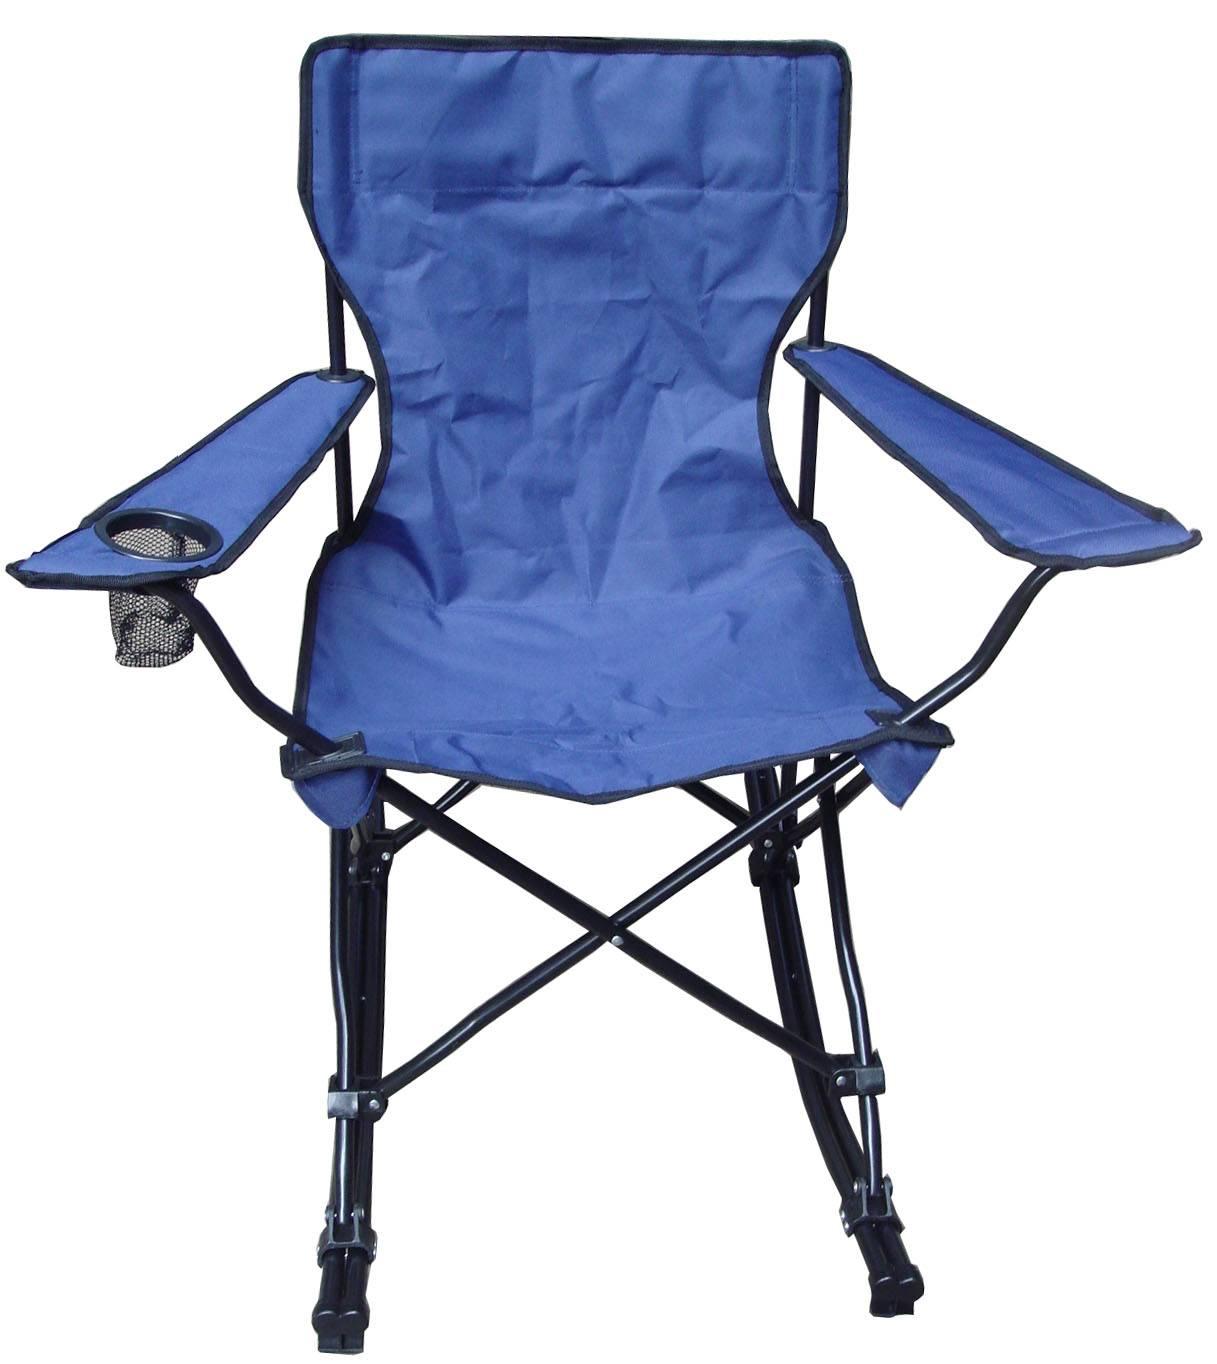 Sell roching chair,leisure chair,outdoor chair,folding chair